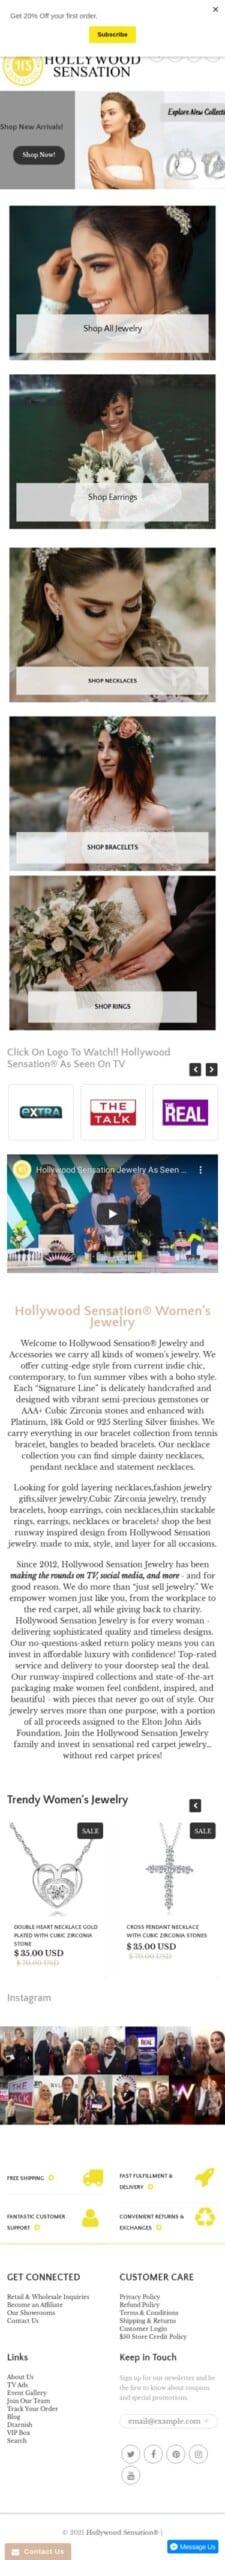 Hollywood Sensation, LLC Coupon